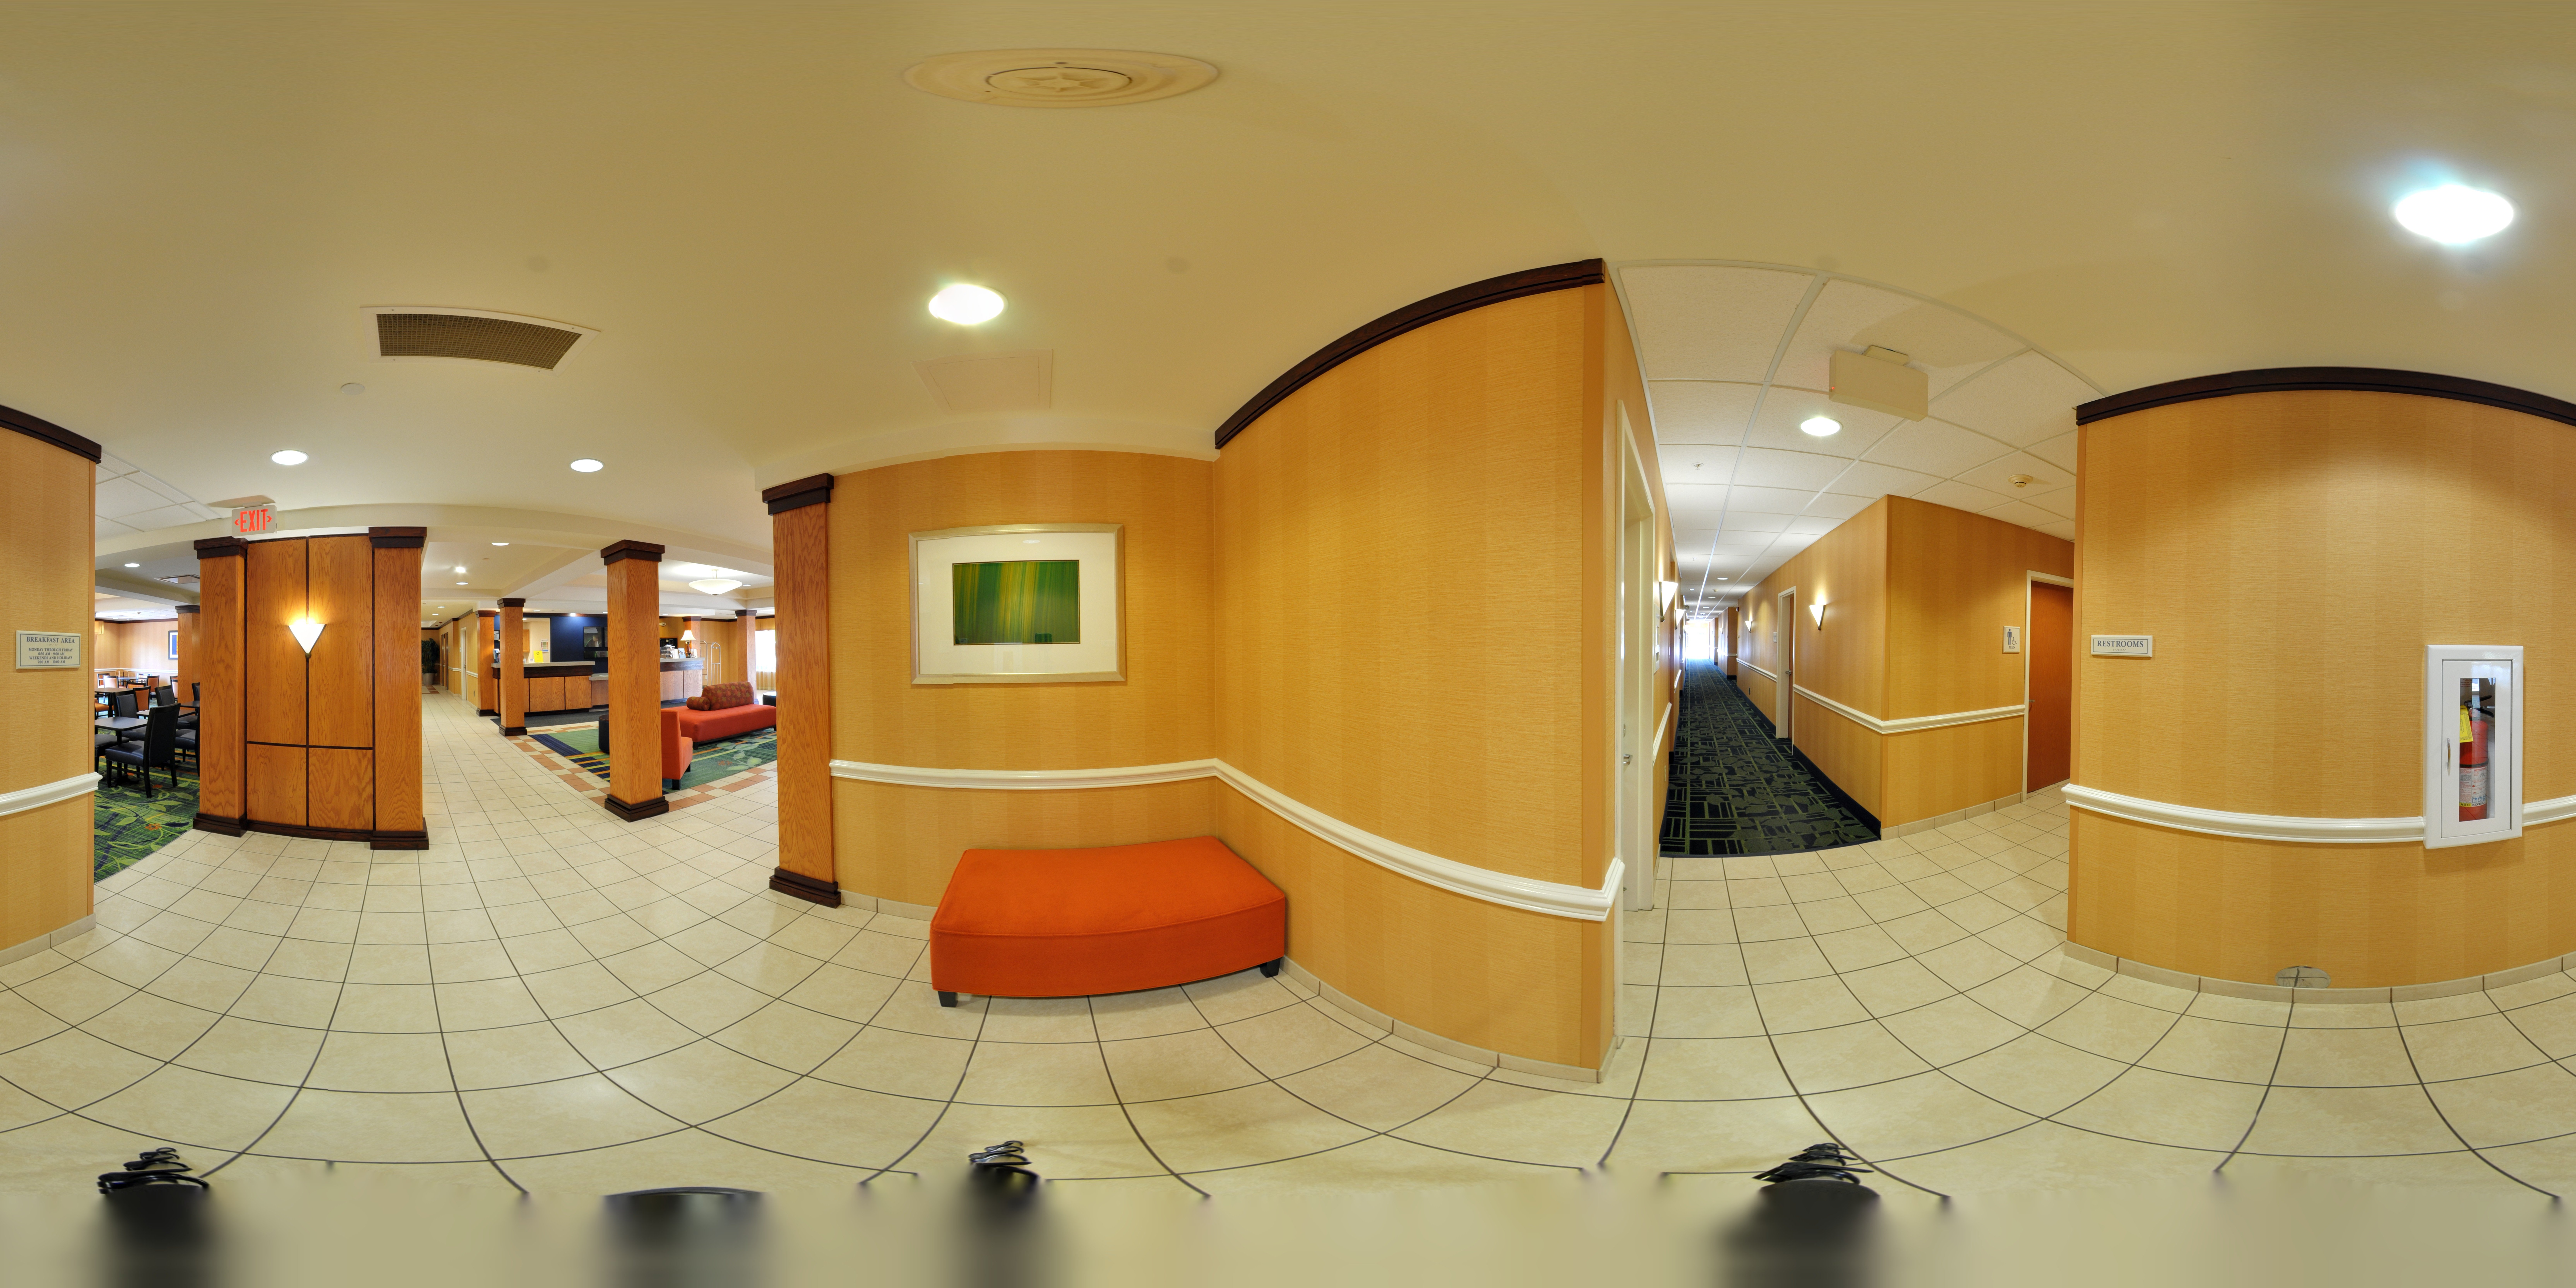 Fairfield Inn & Suites by Marriott Akron South image 25